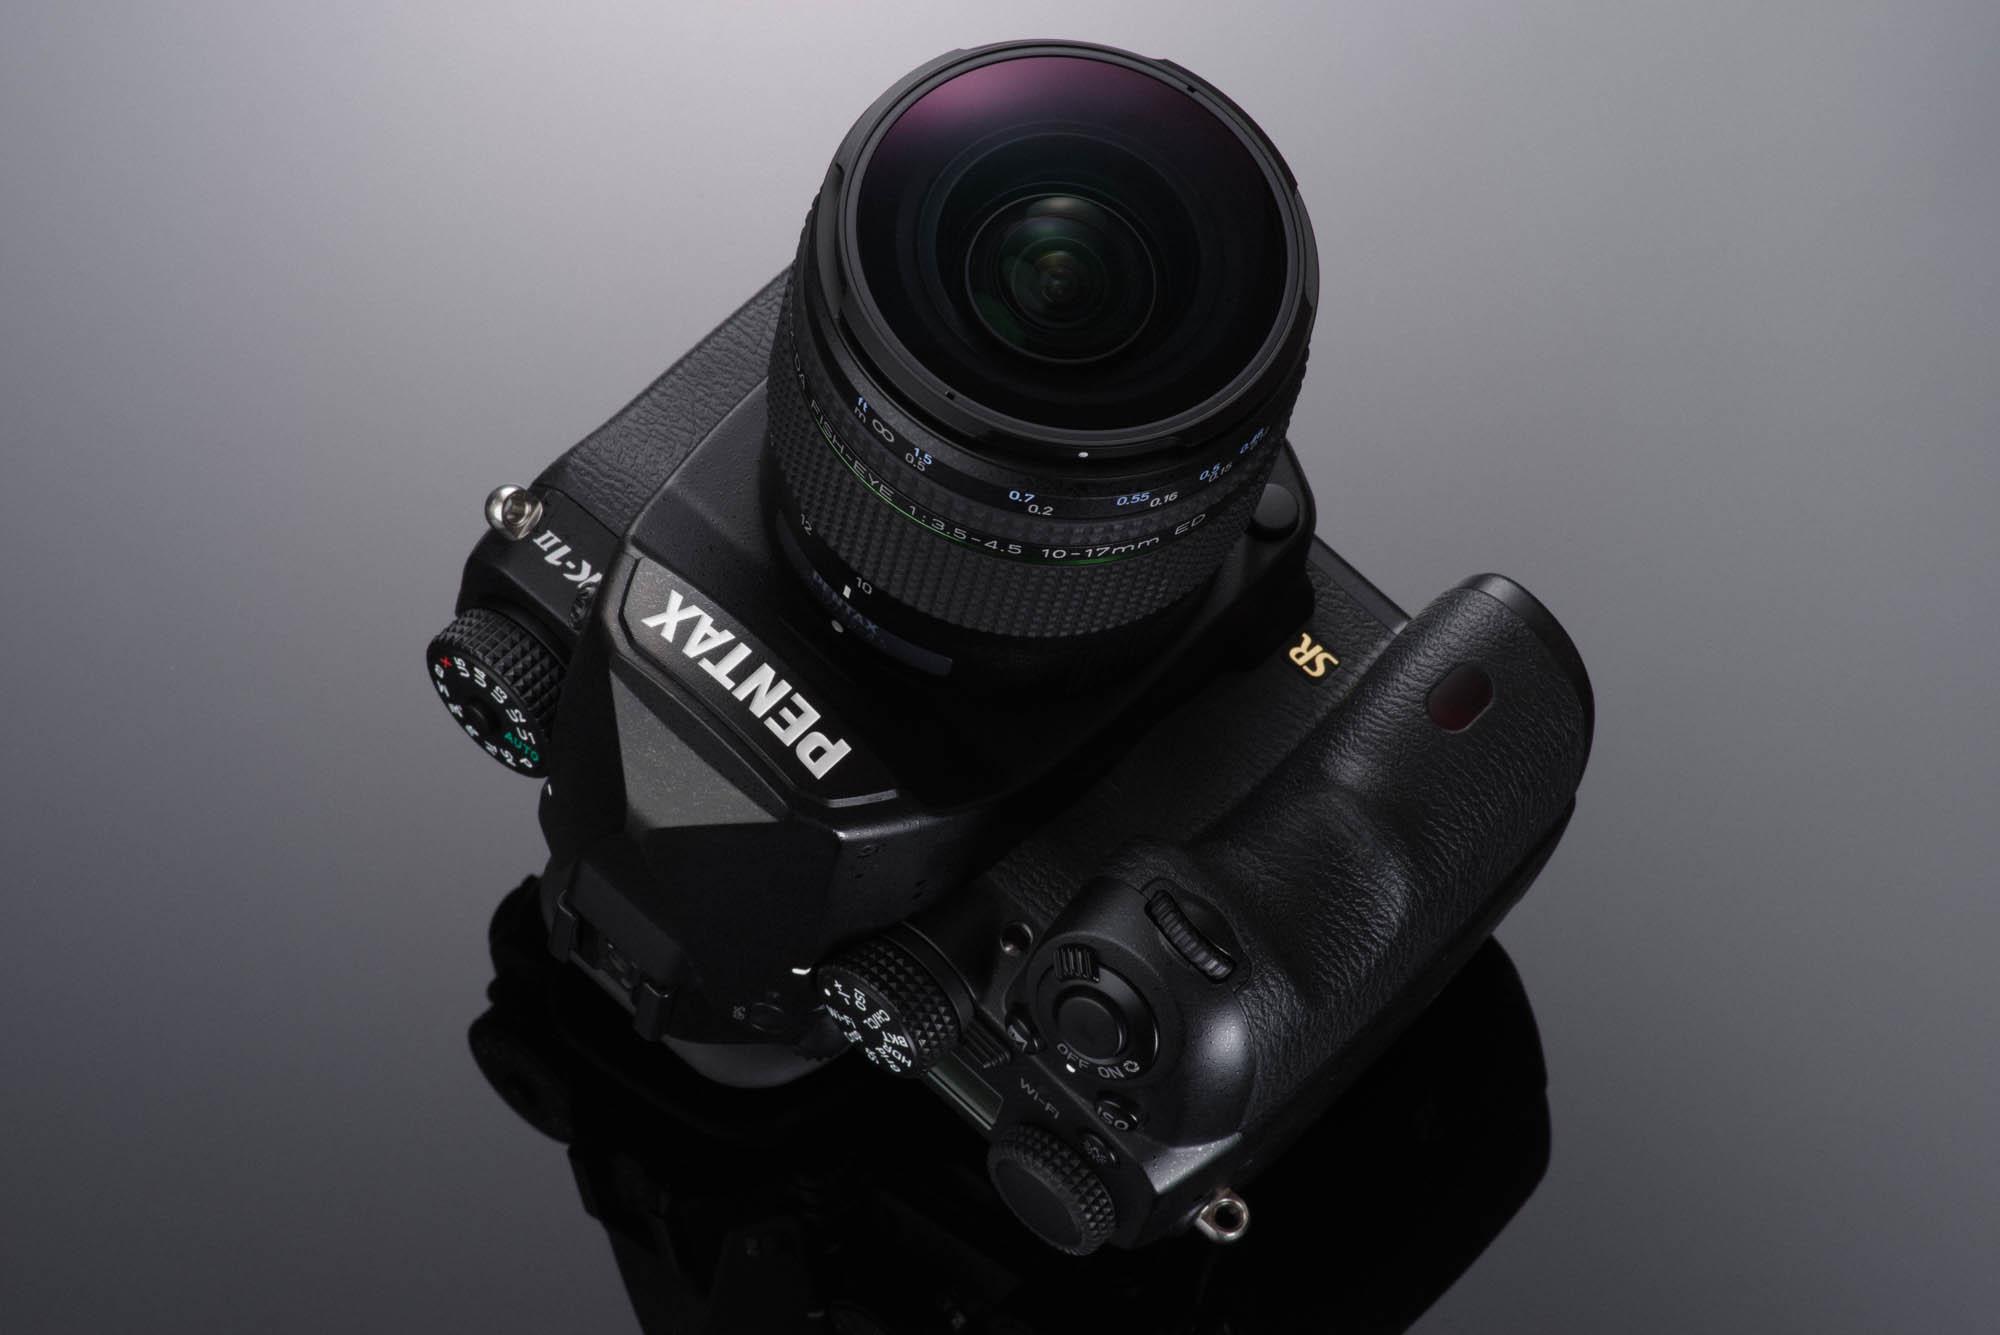 Pentax 10-17mm f/3.5-4.5 fisheye lens